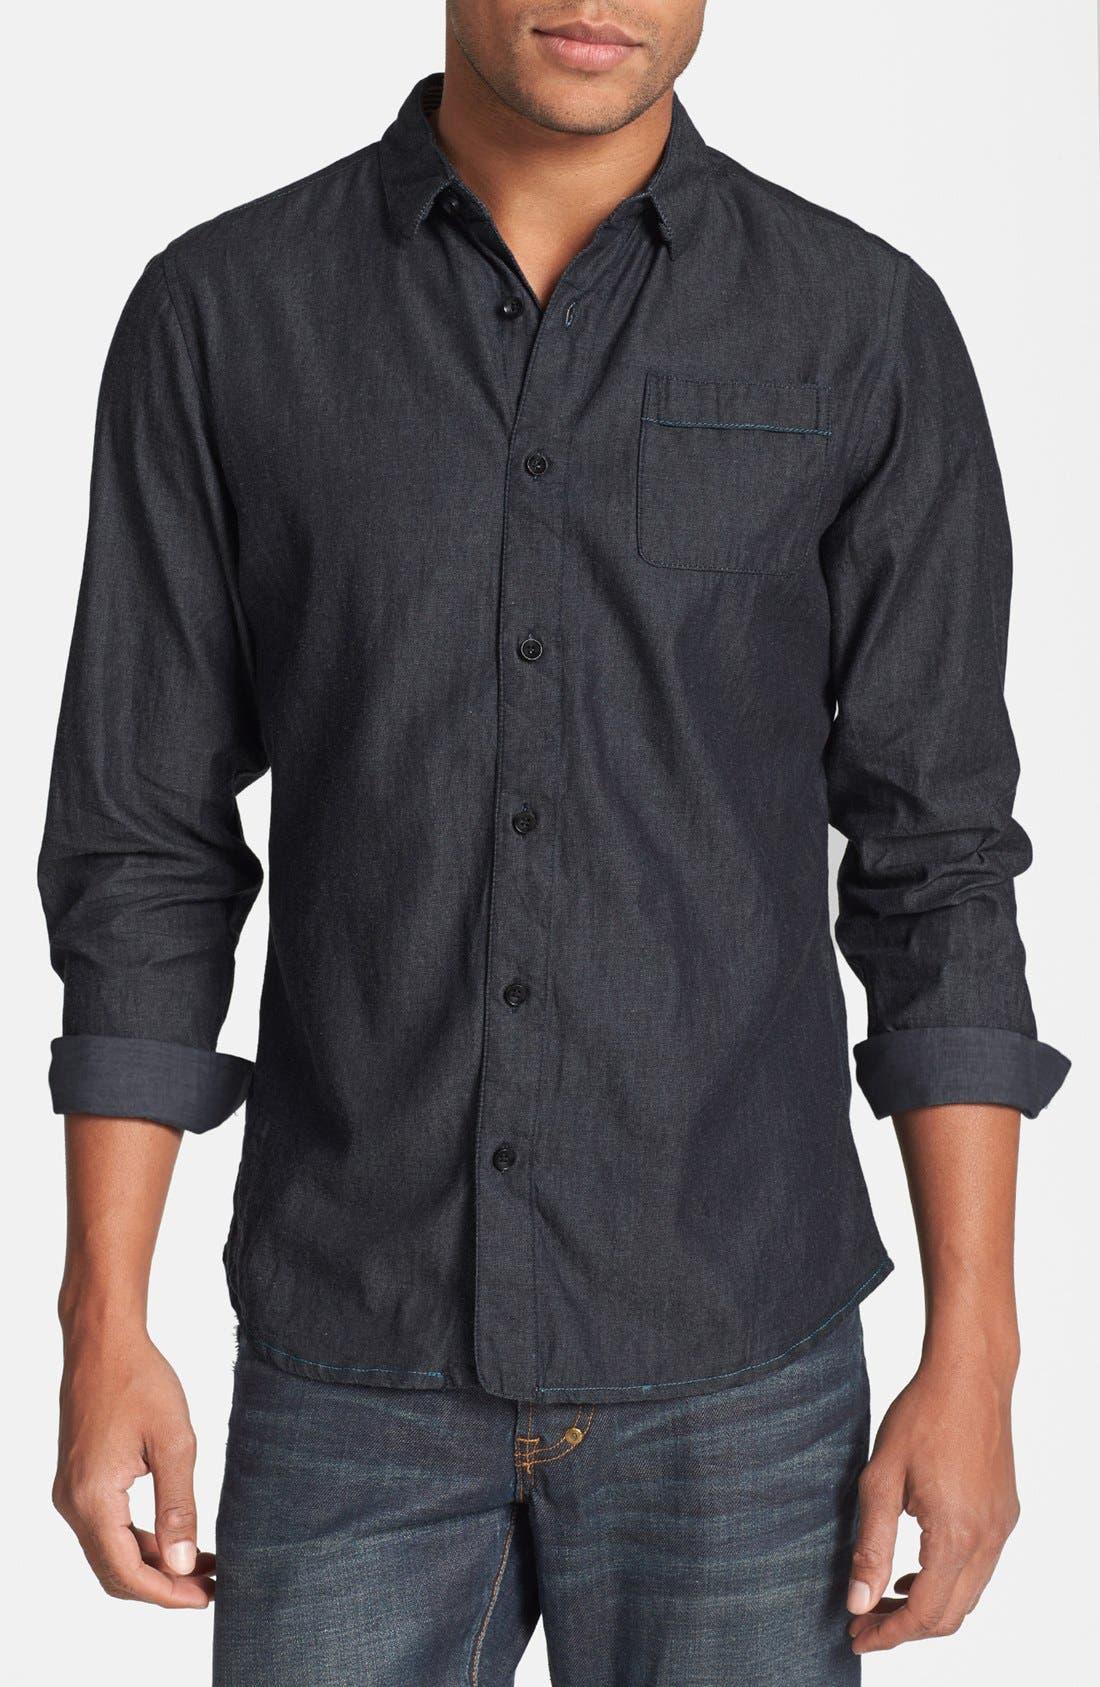 Main Image - Descendant of Thieves Chambray Denim Shirt